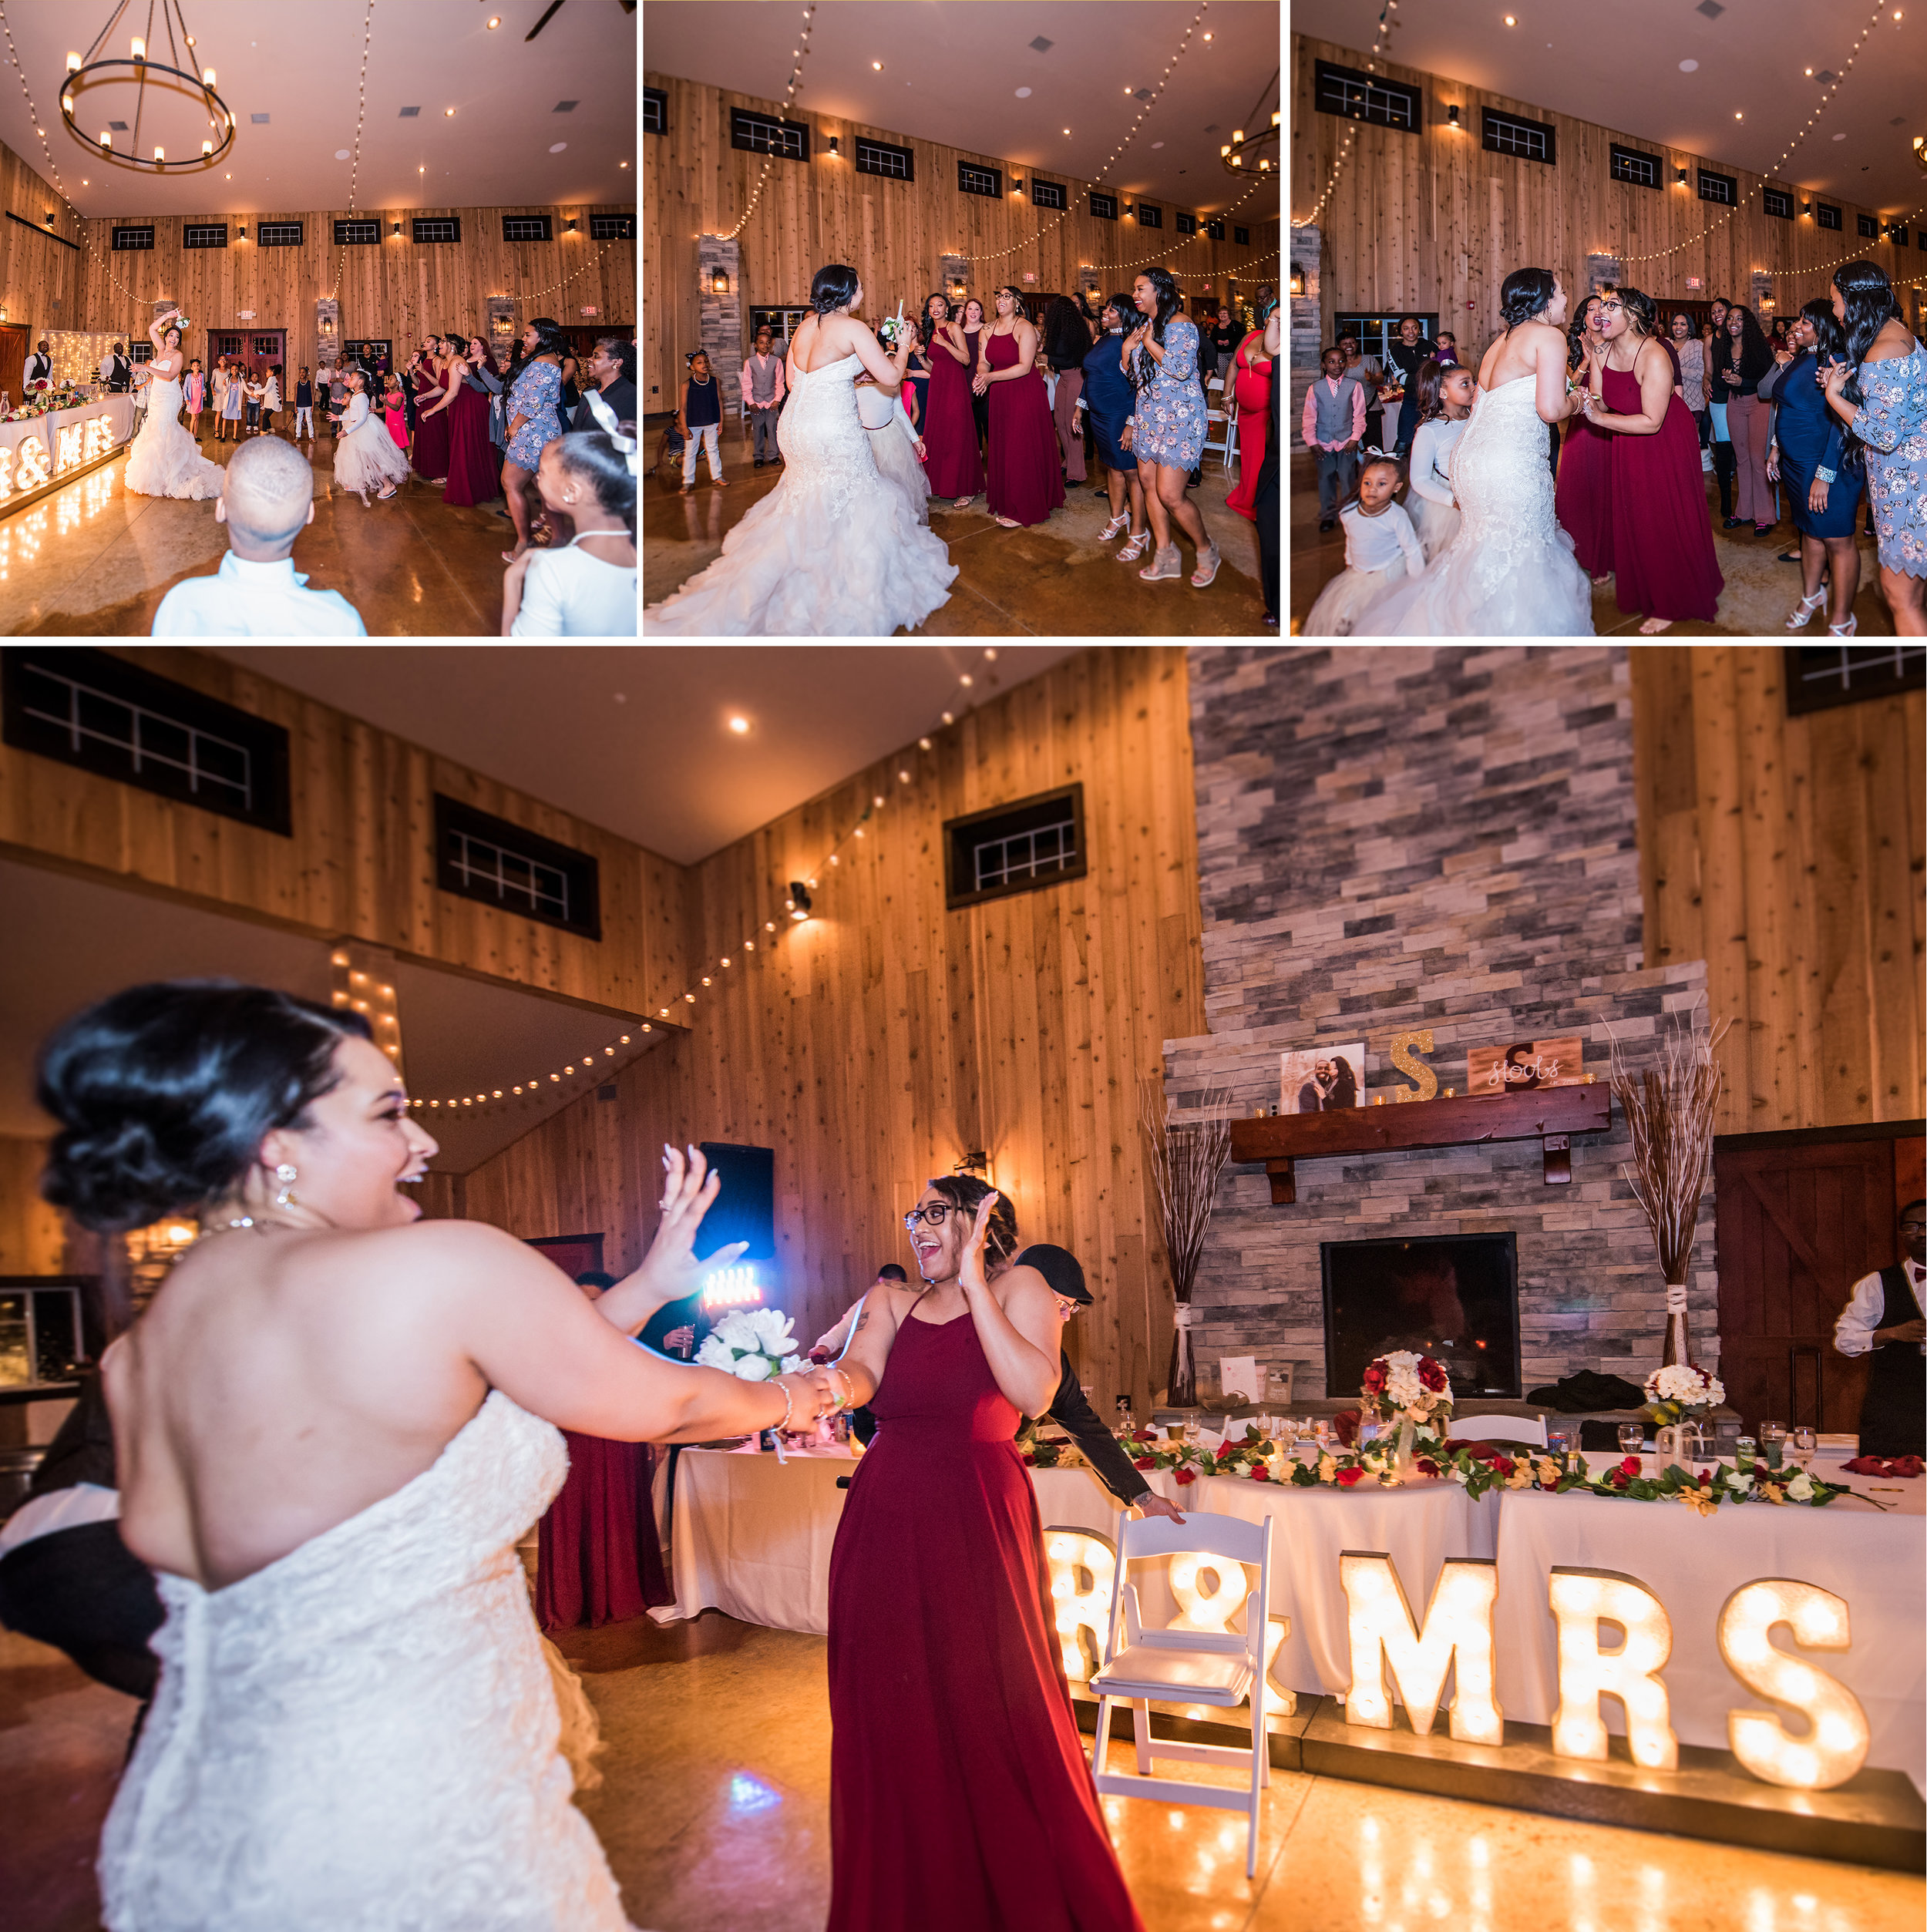 Burlington Iowa Wedding Midwest Photographer Melissa Cervantes _ Chantelle and Isaiah 2238.jpg